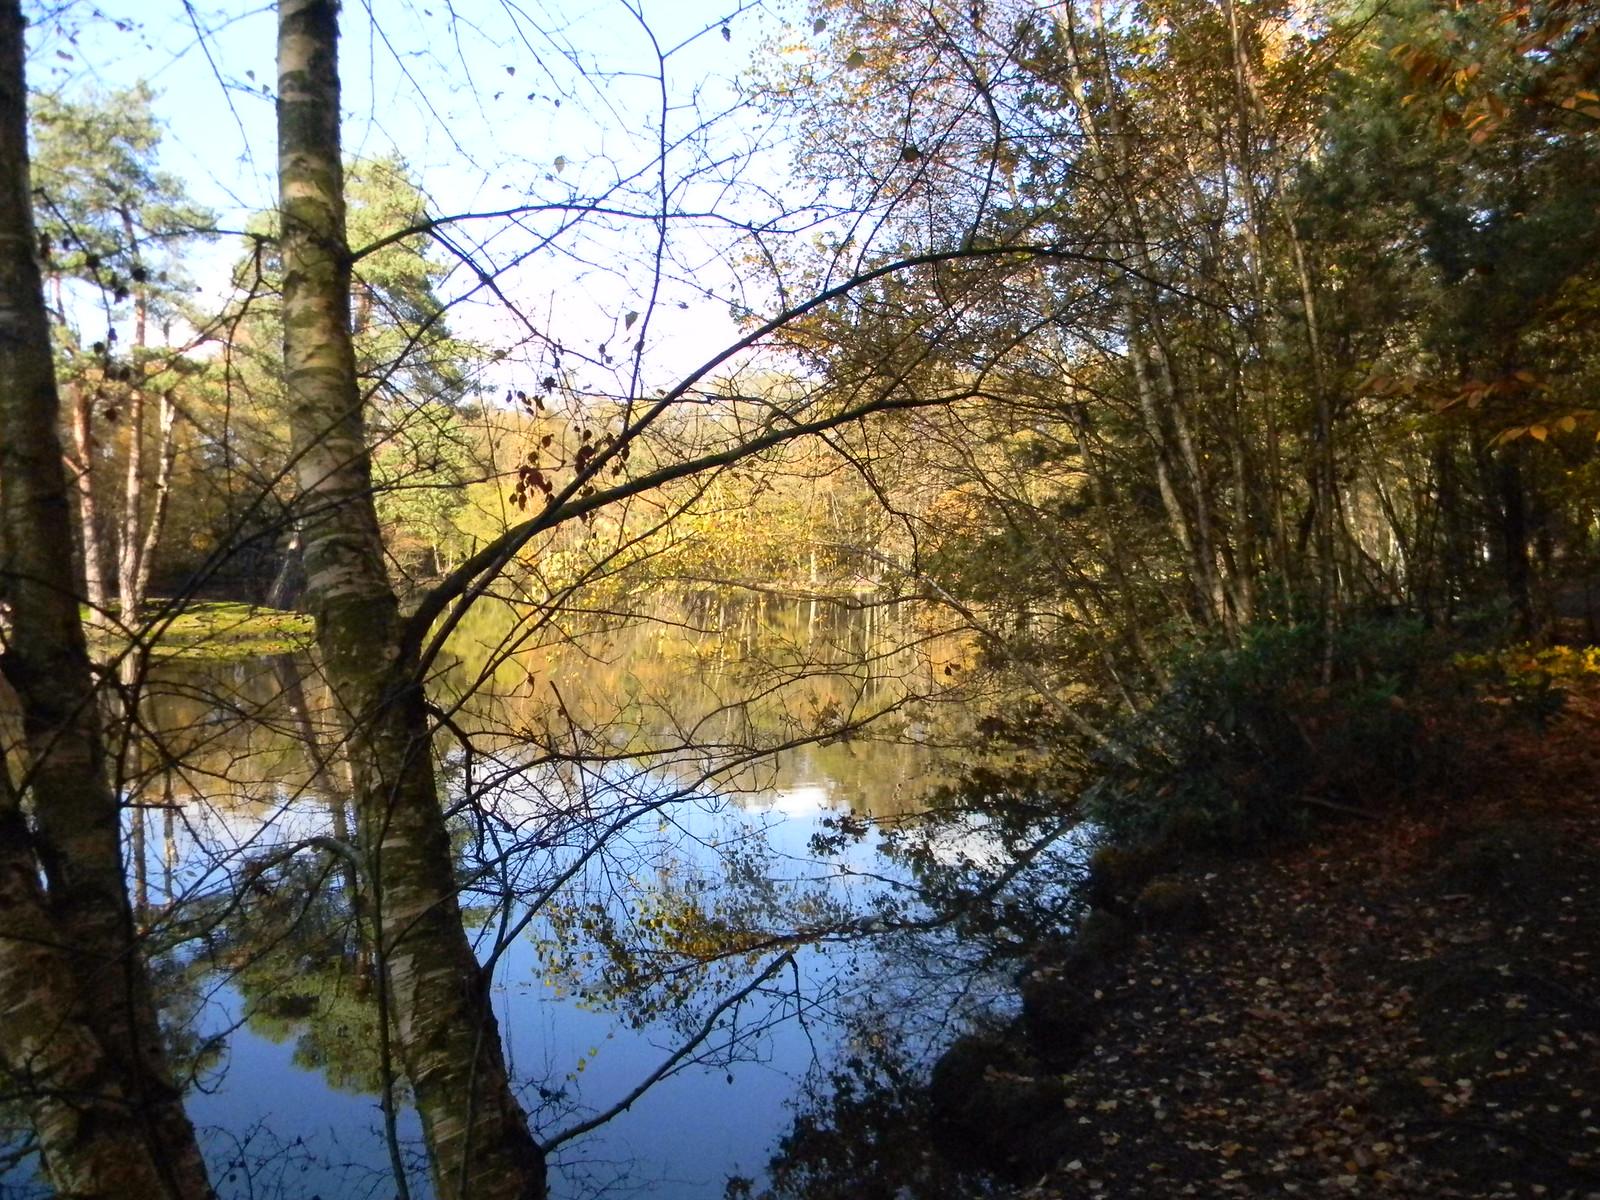 Heath Pond Crowthorne to Sandhurst (avoiding Eversley)